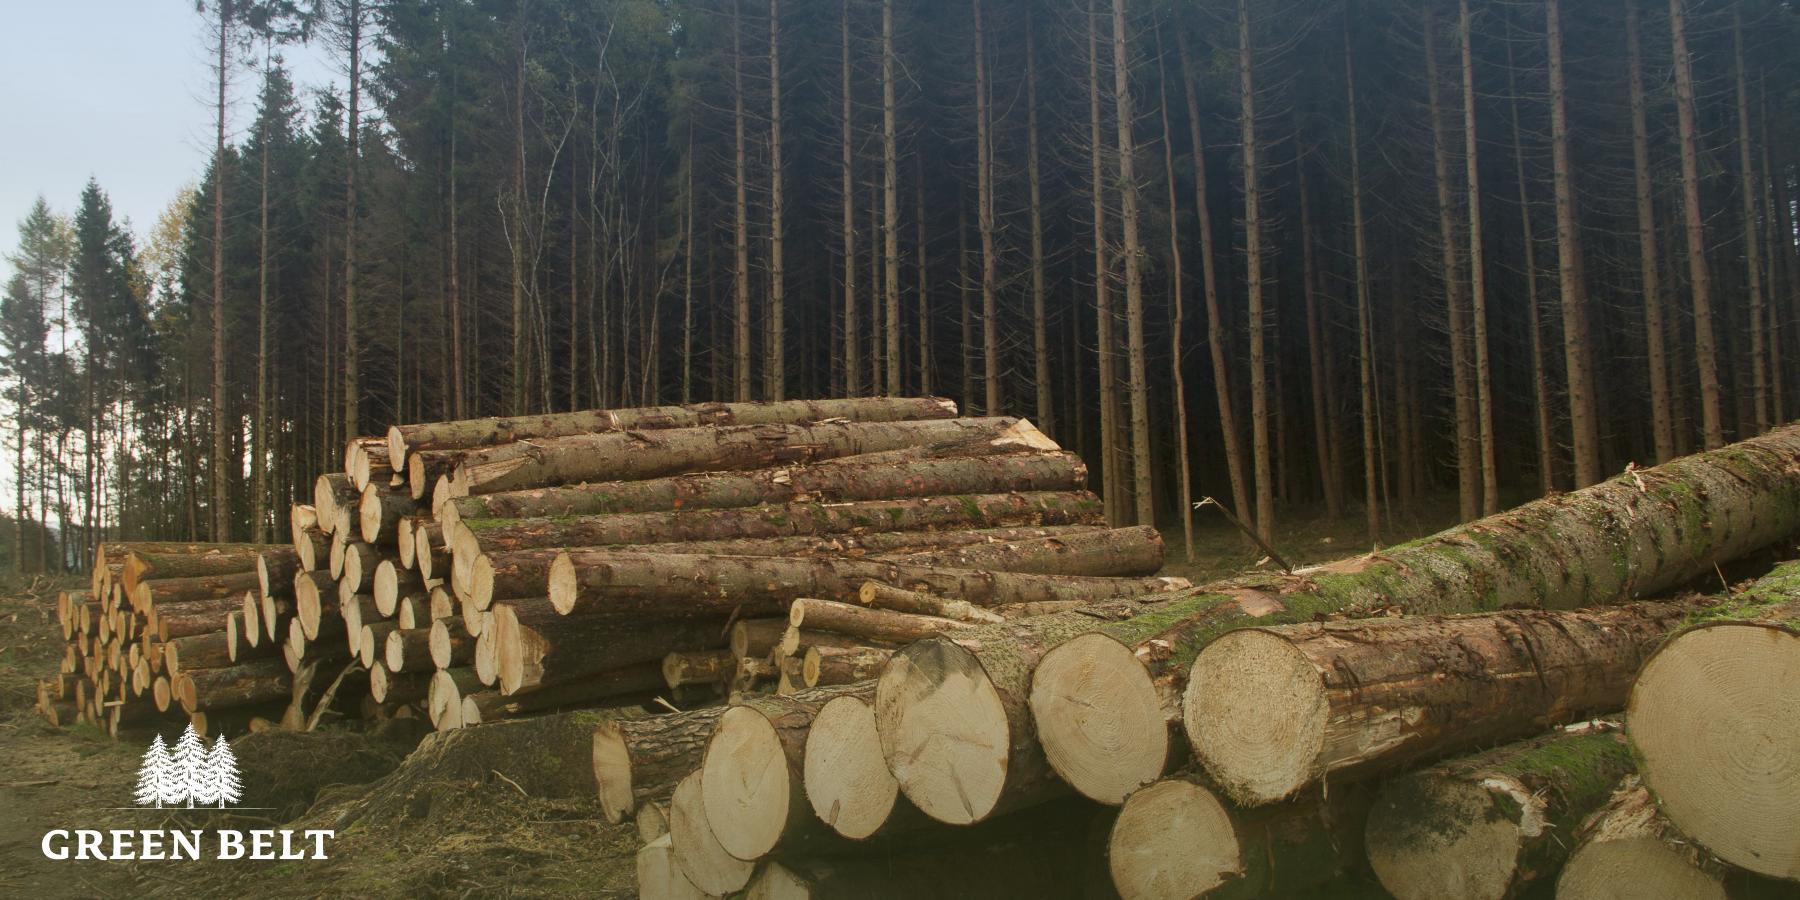 Harvesting Trees for Renewable Energy